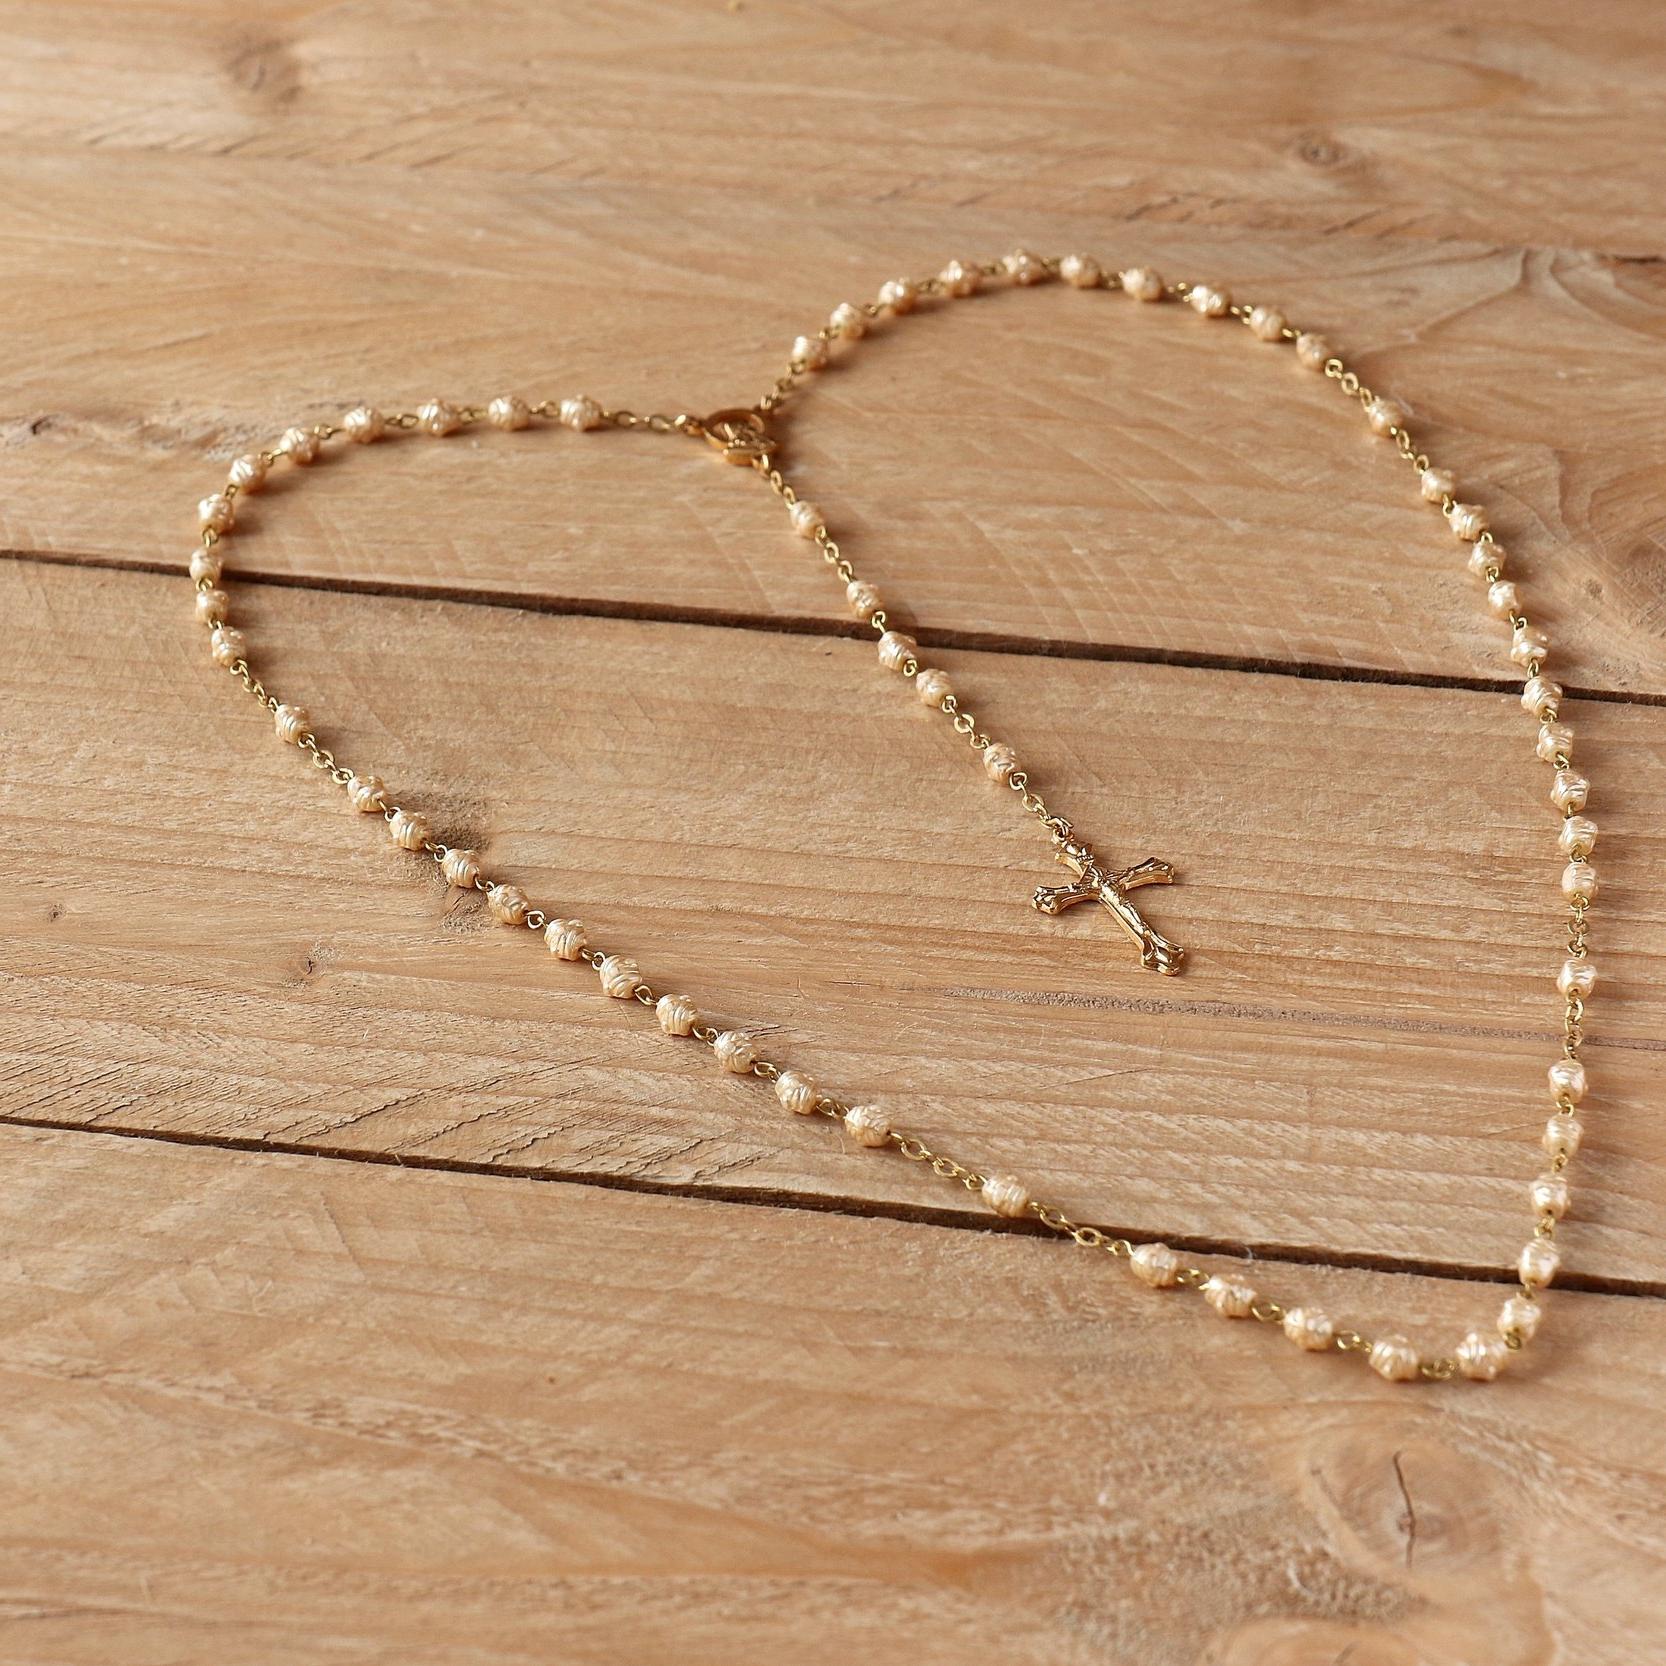 beads-cross-prayer-236336.jpg